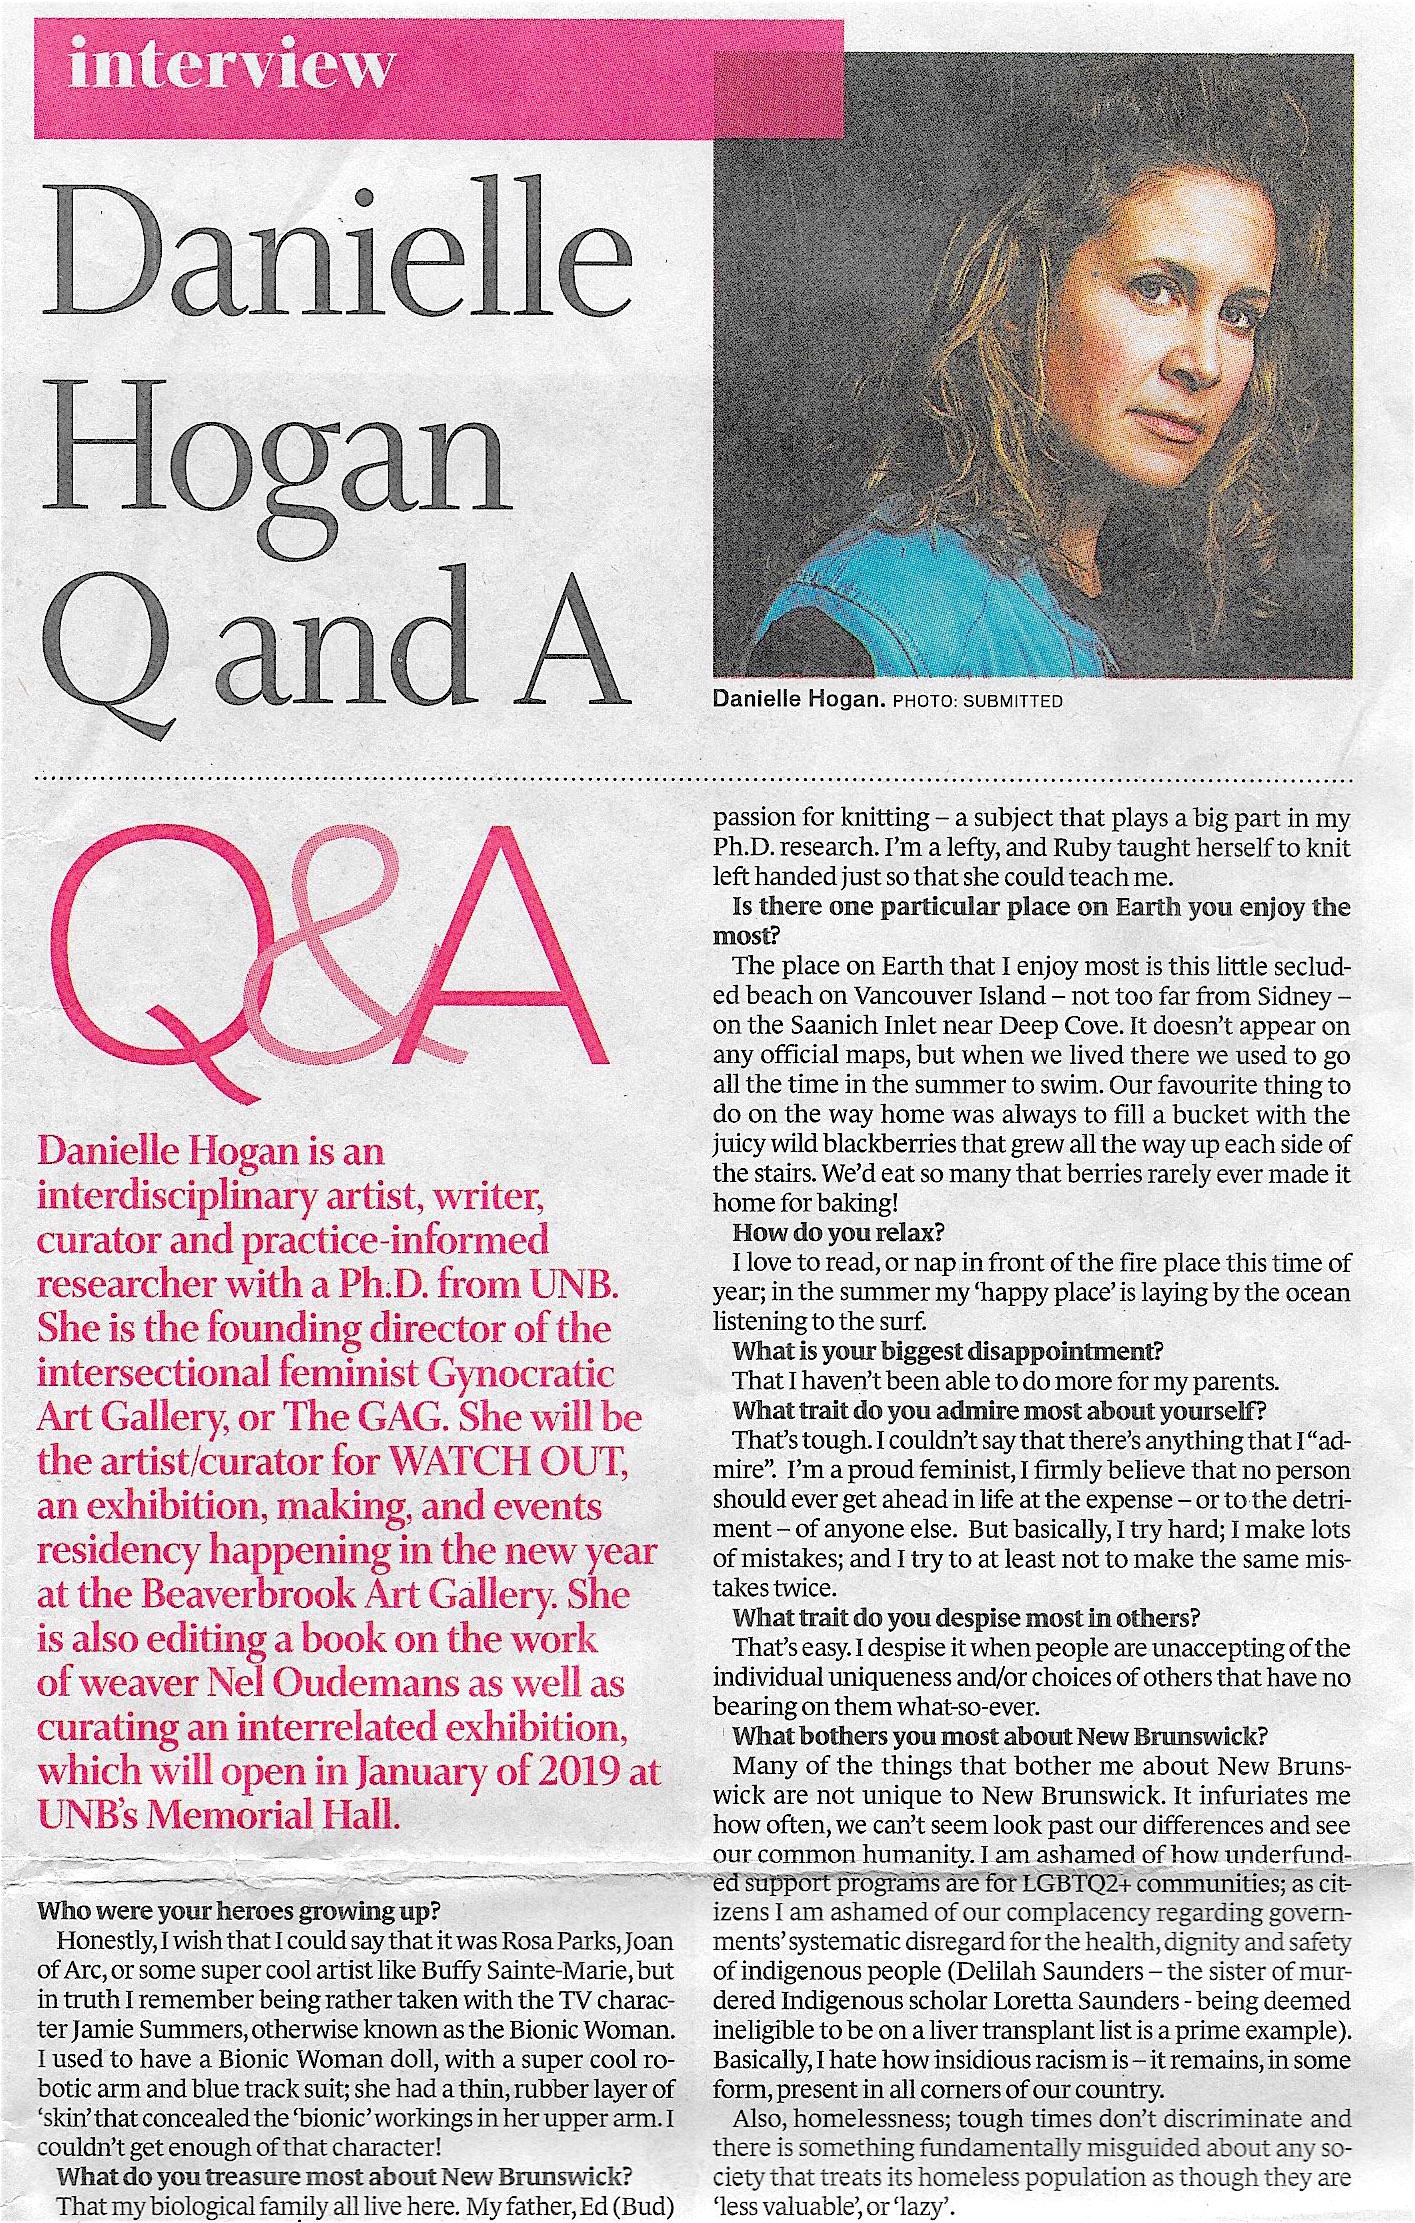 Hogan_TJ SALON interview